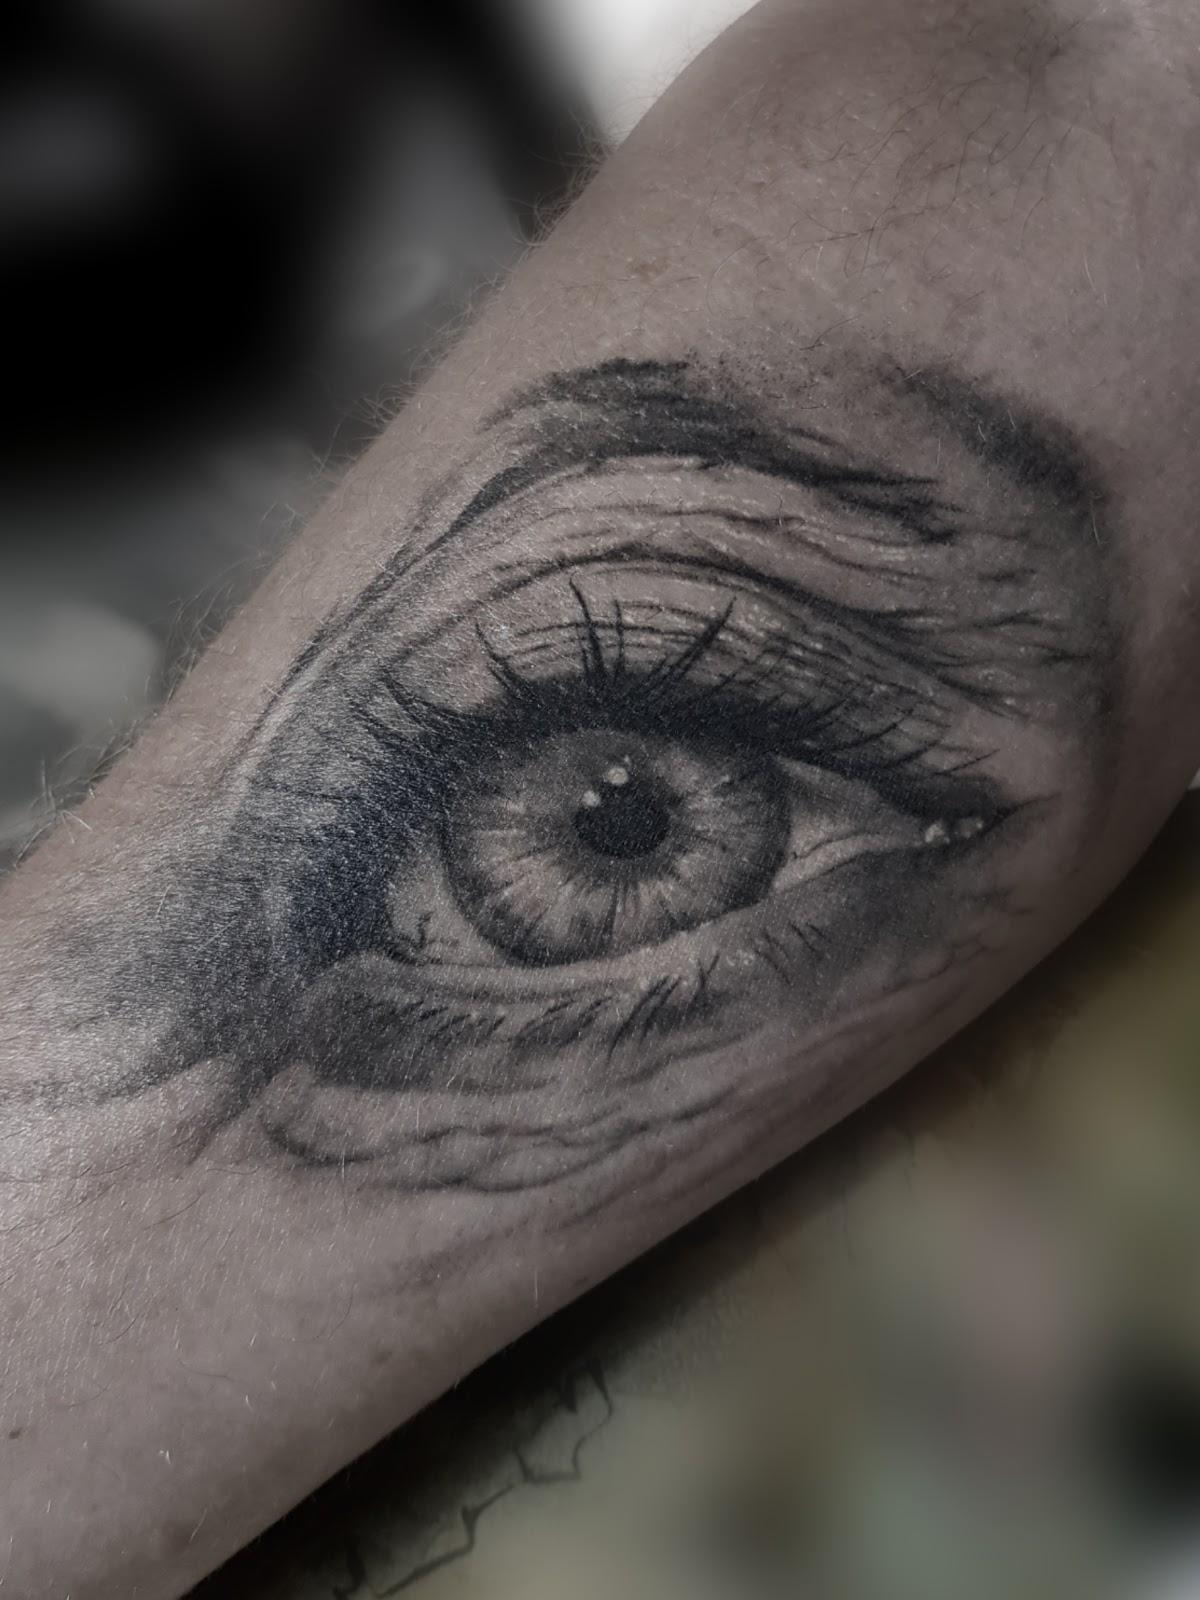 Tattoo-Auge